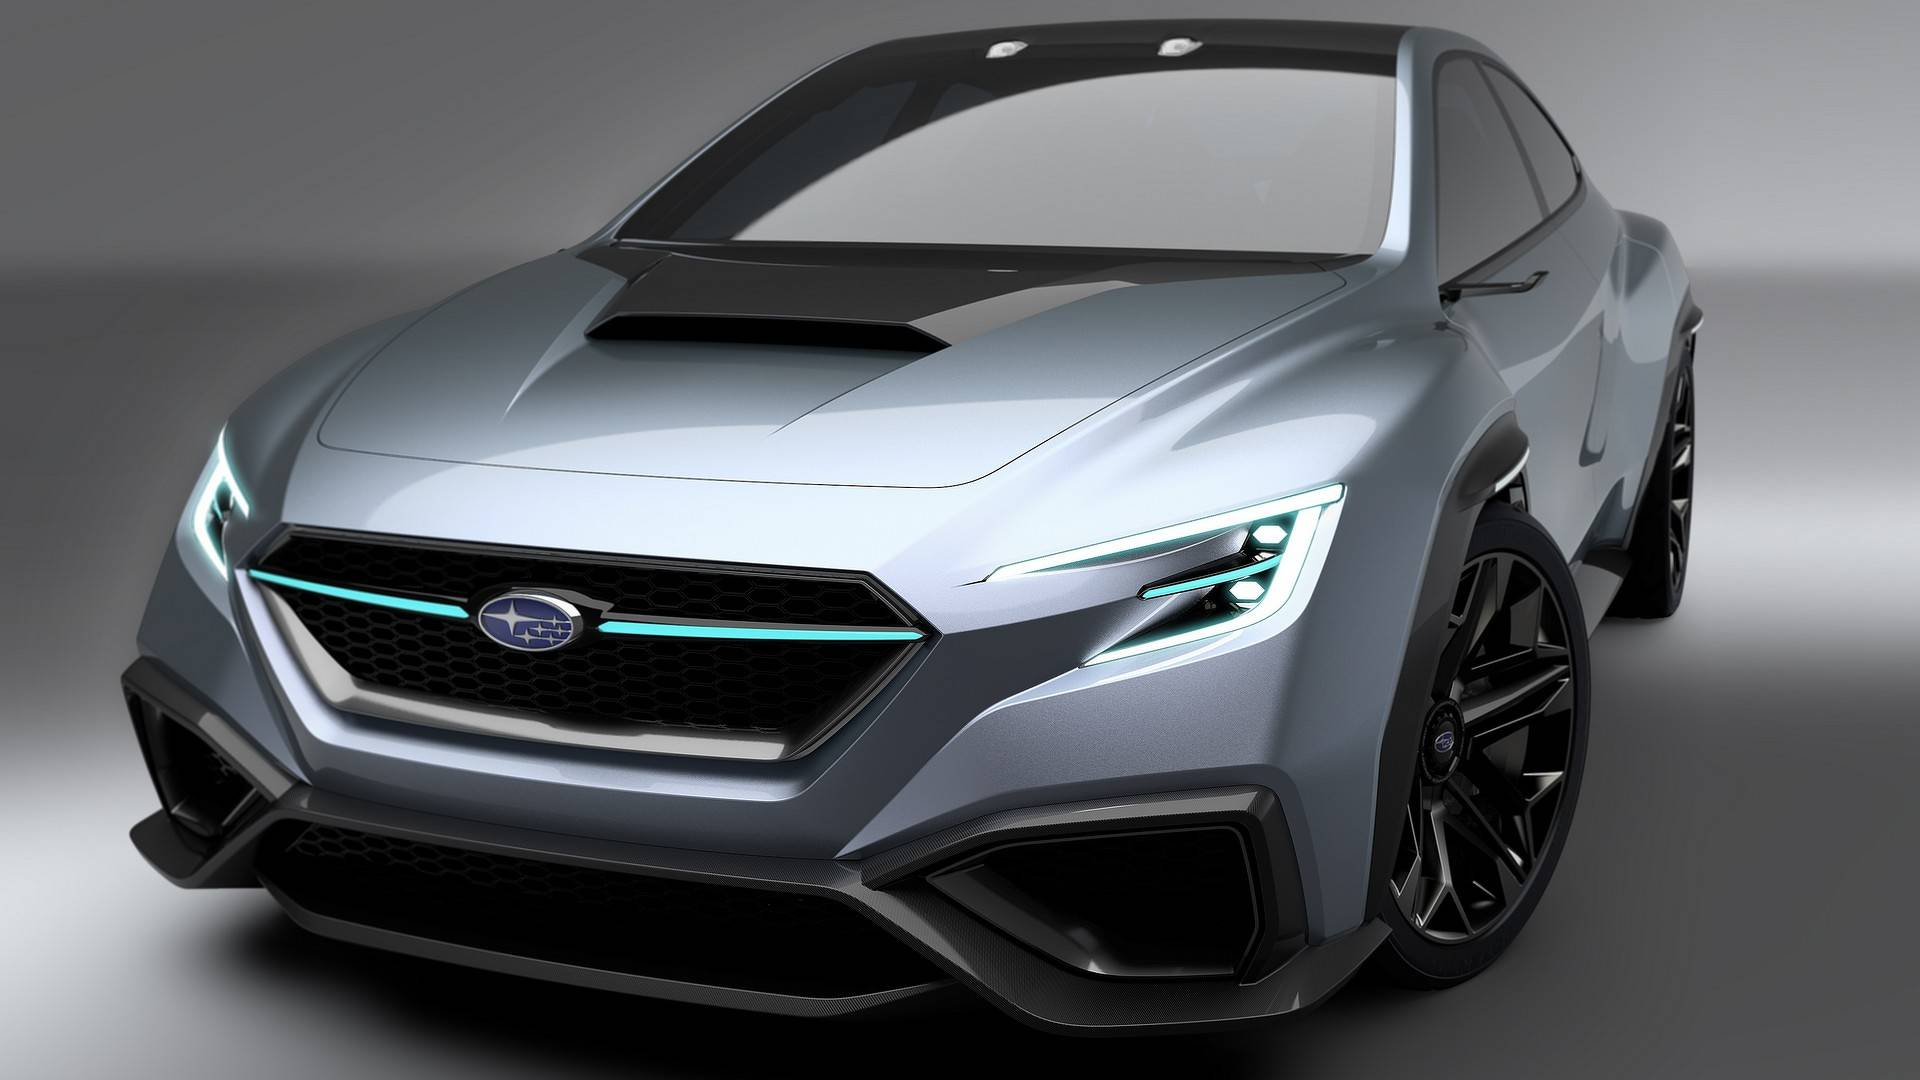 2022 subaru wrx sti expected with fa24 2.4-liter turbo